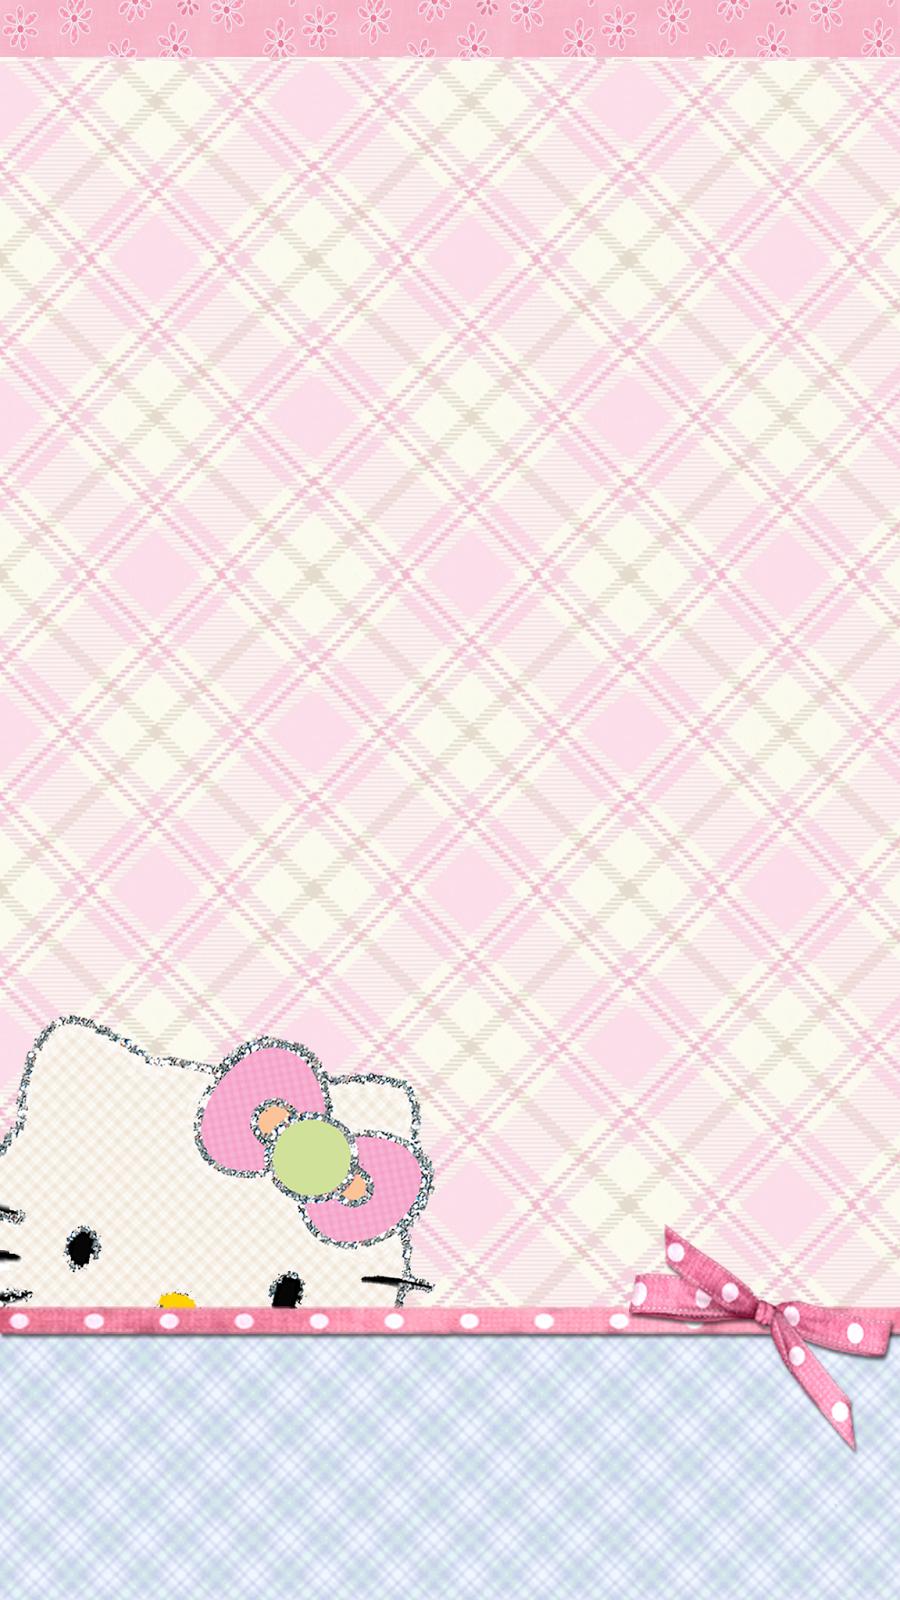 Pug Iphone Wallpaper Love Pink Pastel Frost Hellokitty Wallpaper Freebie